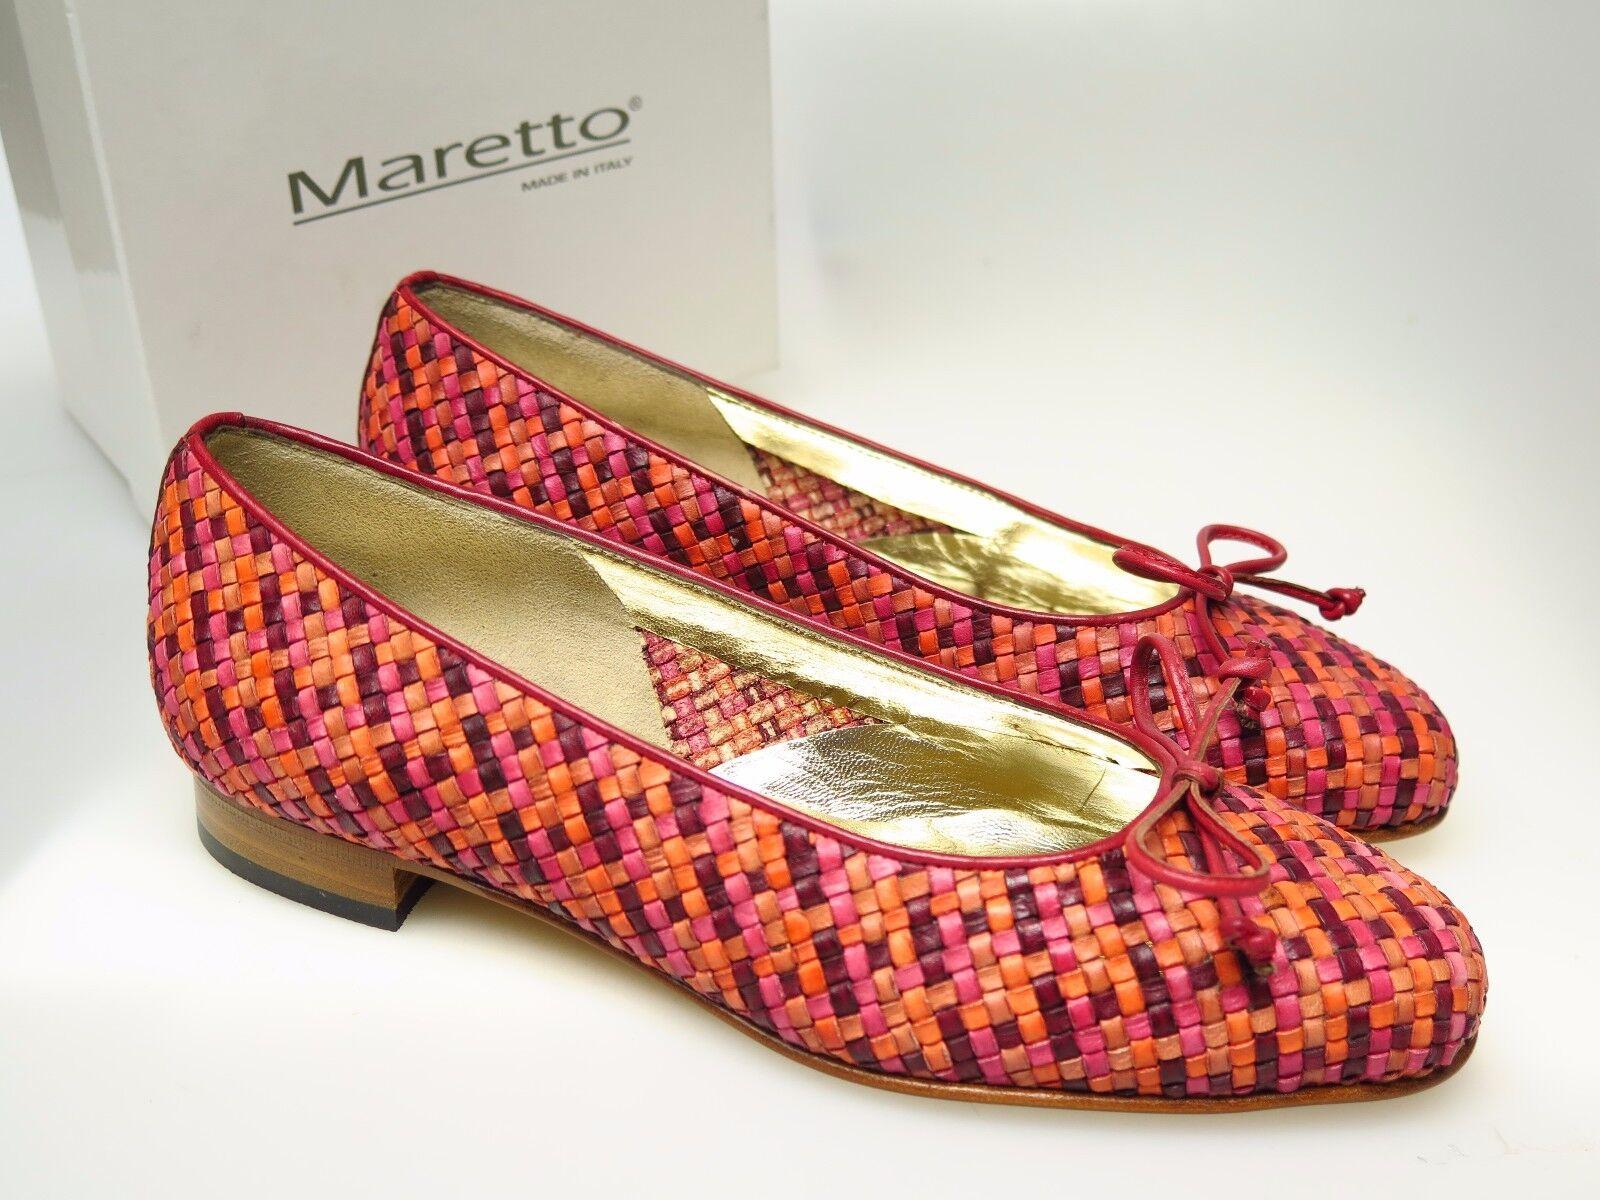 MARETTO MARETTO MARETTO  Designer Damenschuhe 6231 Ameta Rosso Leder Schuhe Gr. 36,5 NEU 77a453